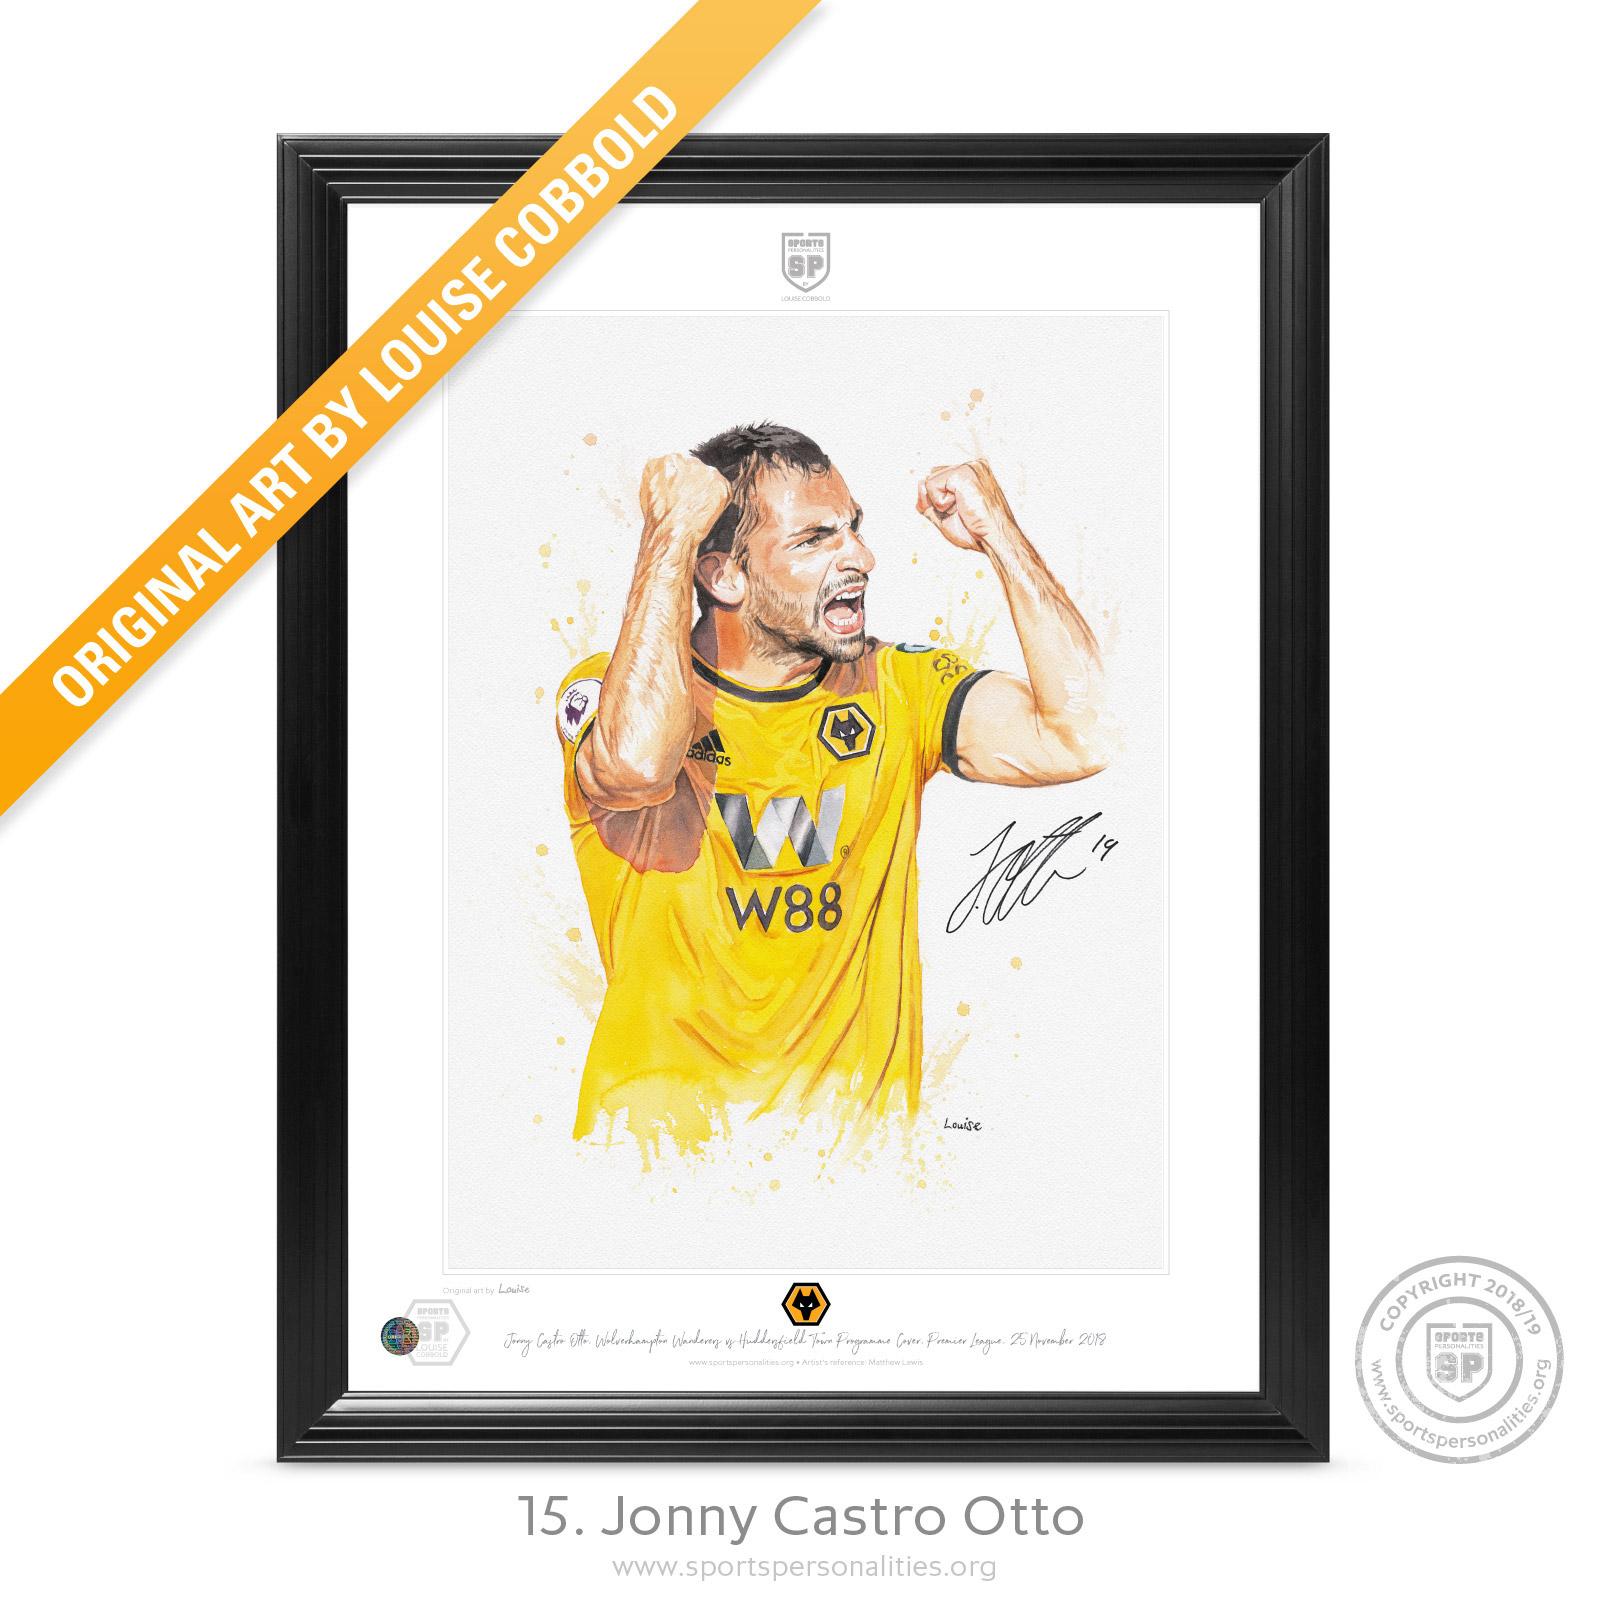 2018_19-SP_Auction_2_15_Jonny_Castro_Otto.jpg